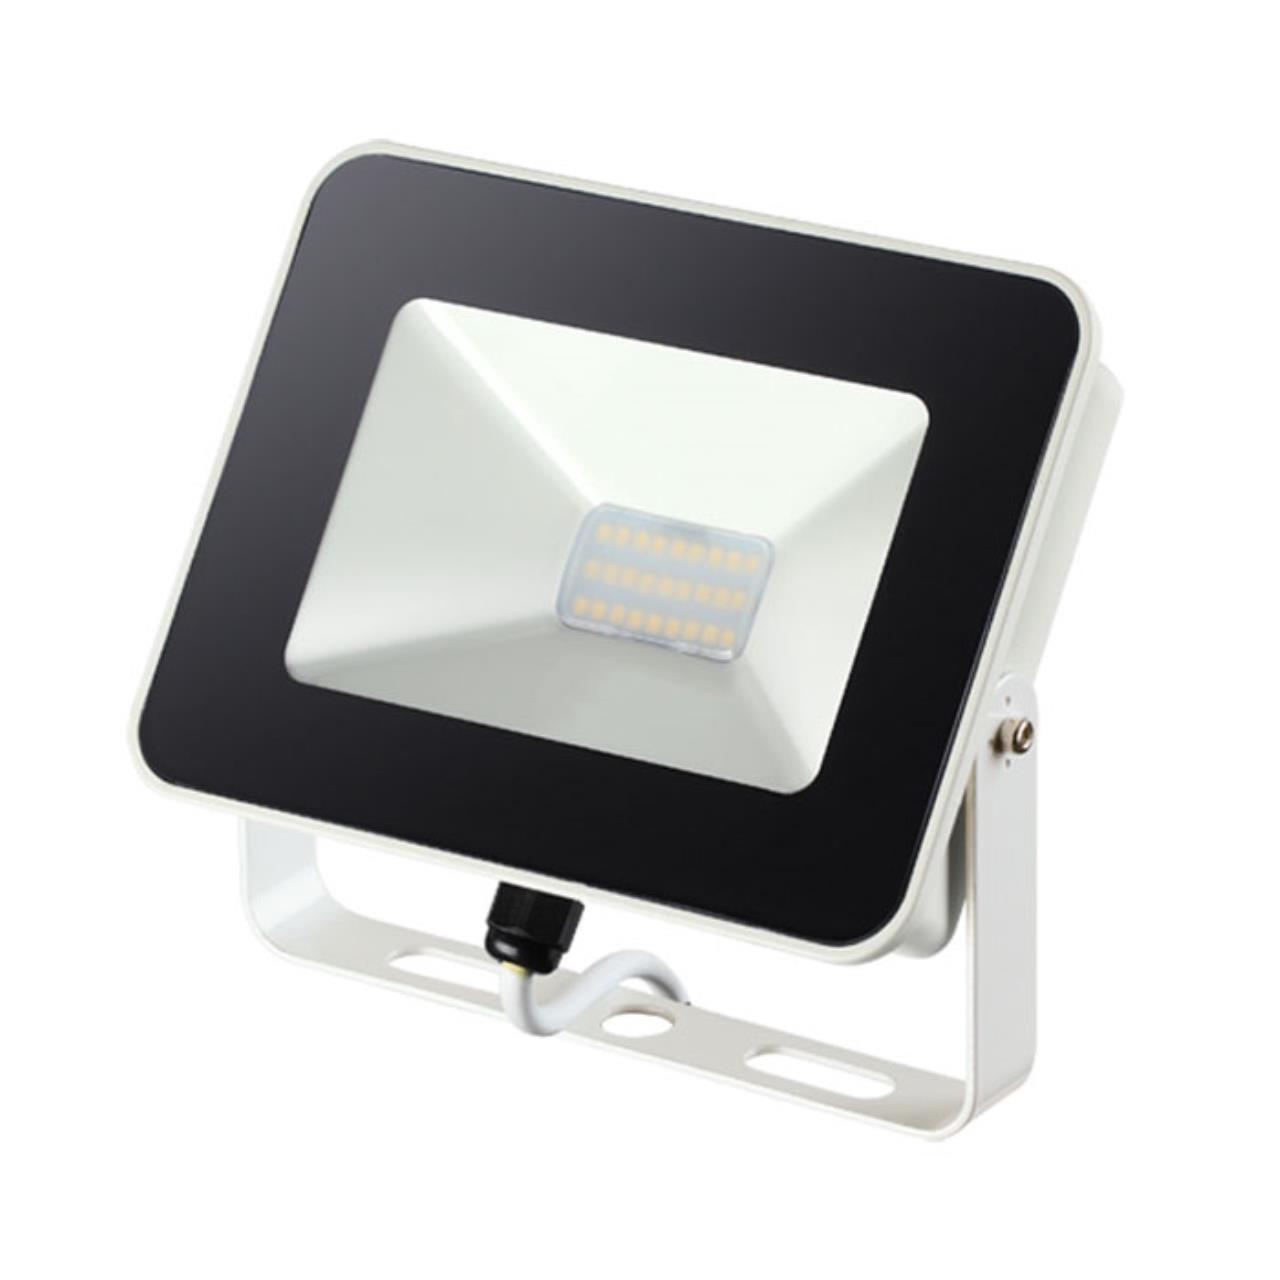 357526 STREET NT18 176 белый Ландшафтный прожектор IP65 LED 4000K 20W 220-240V ARMIN